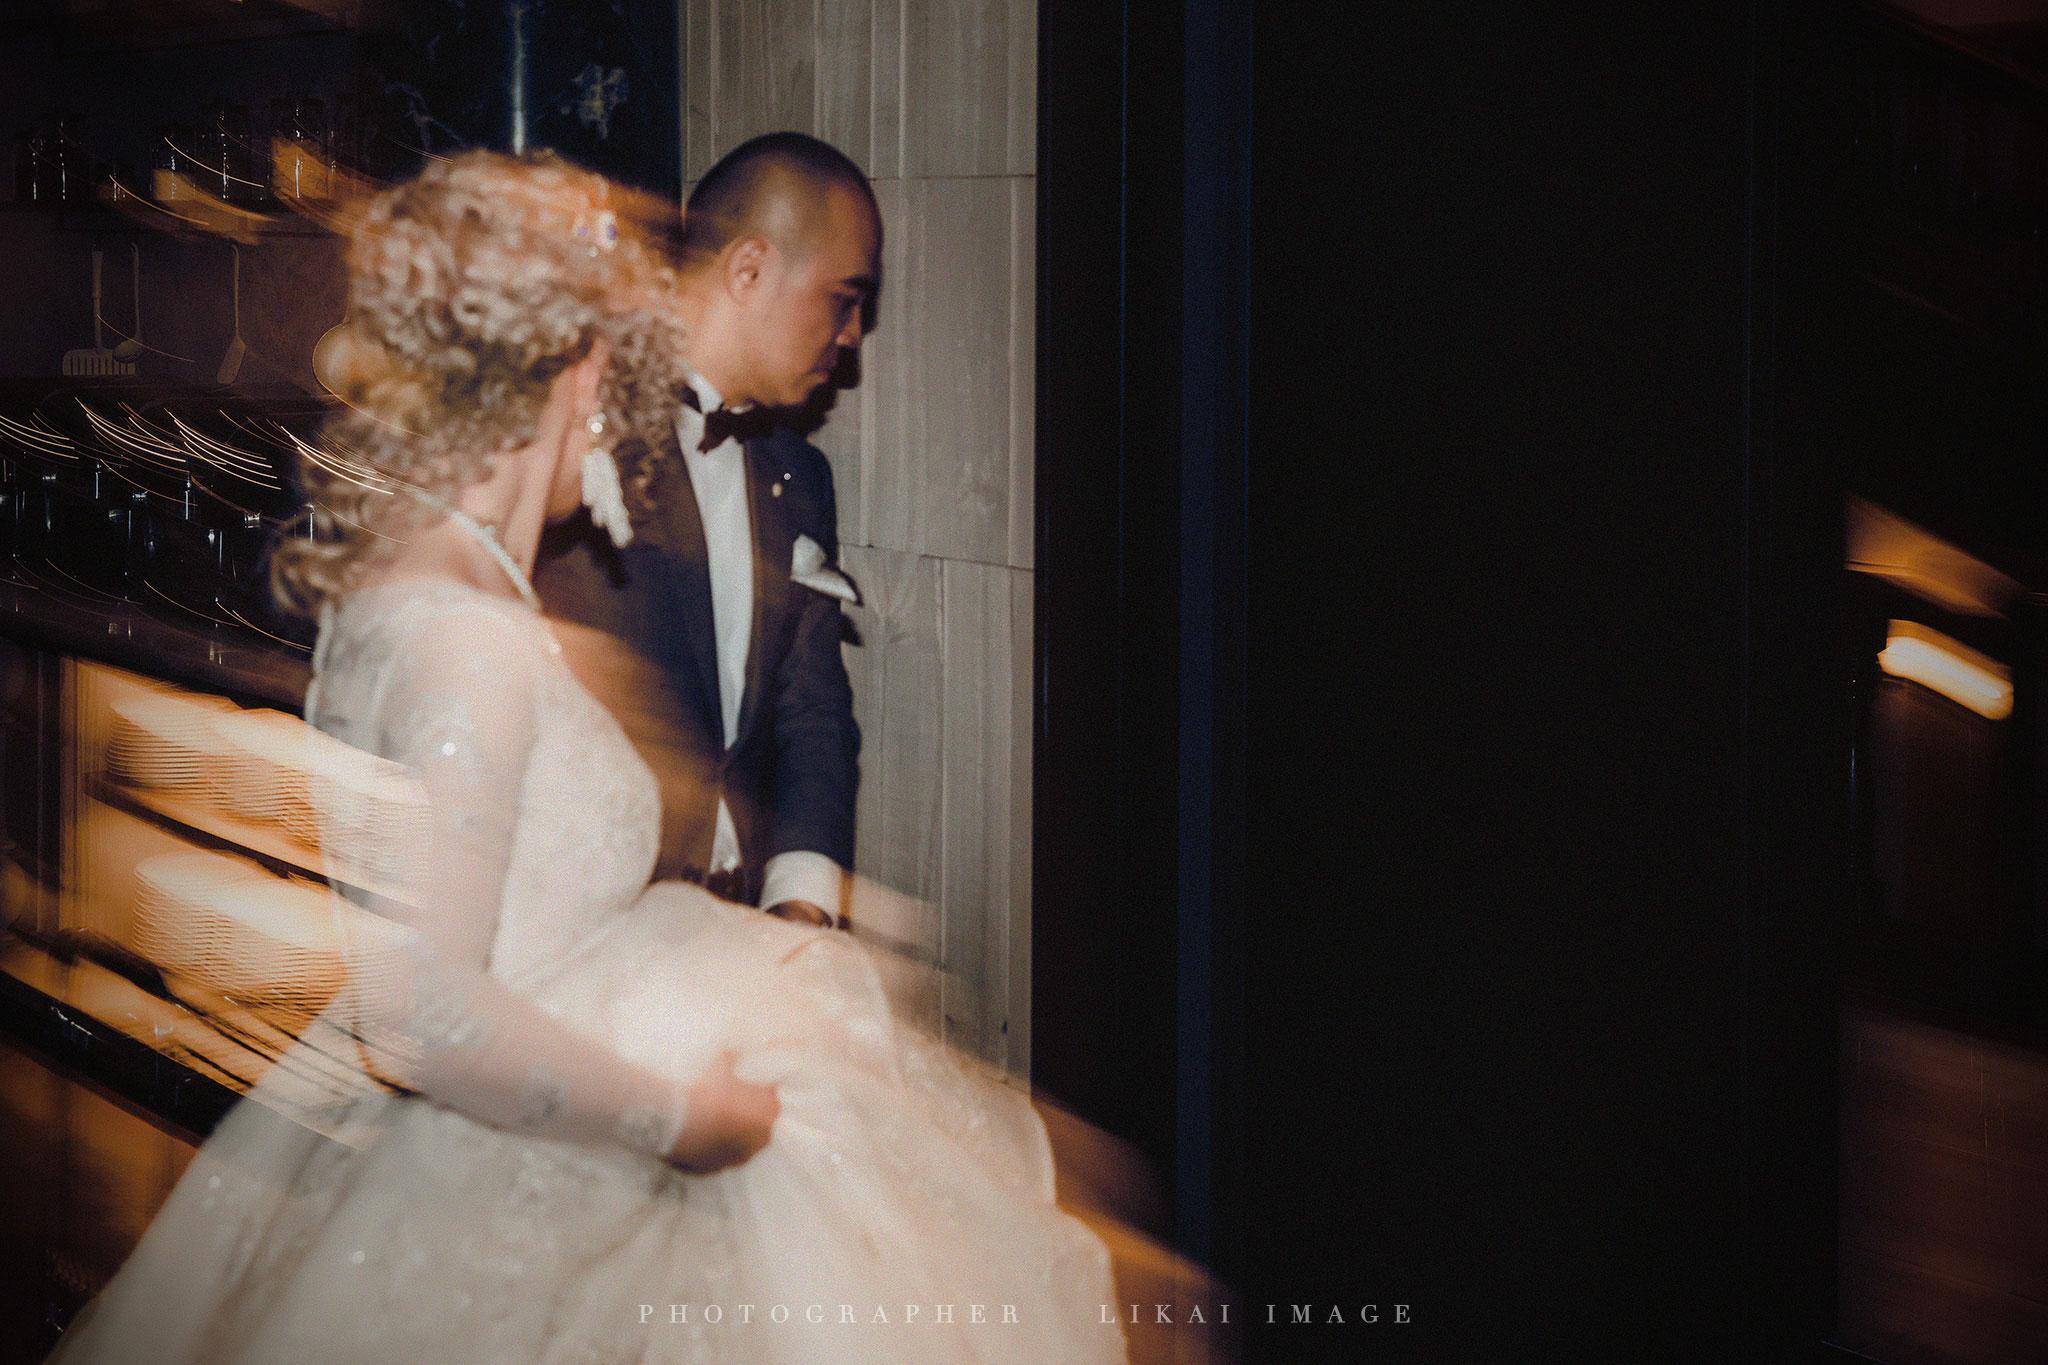 婚禮紀錄 - Jessica & Daven - 驢子餐廳